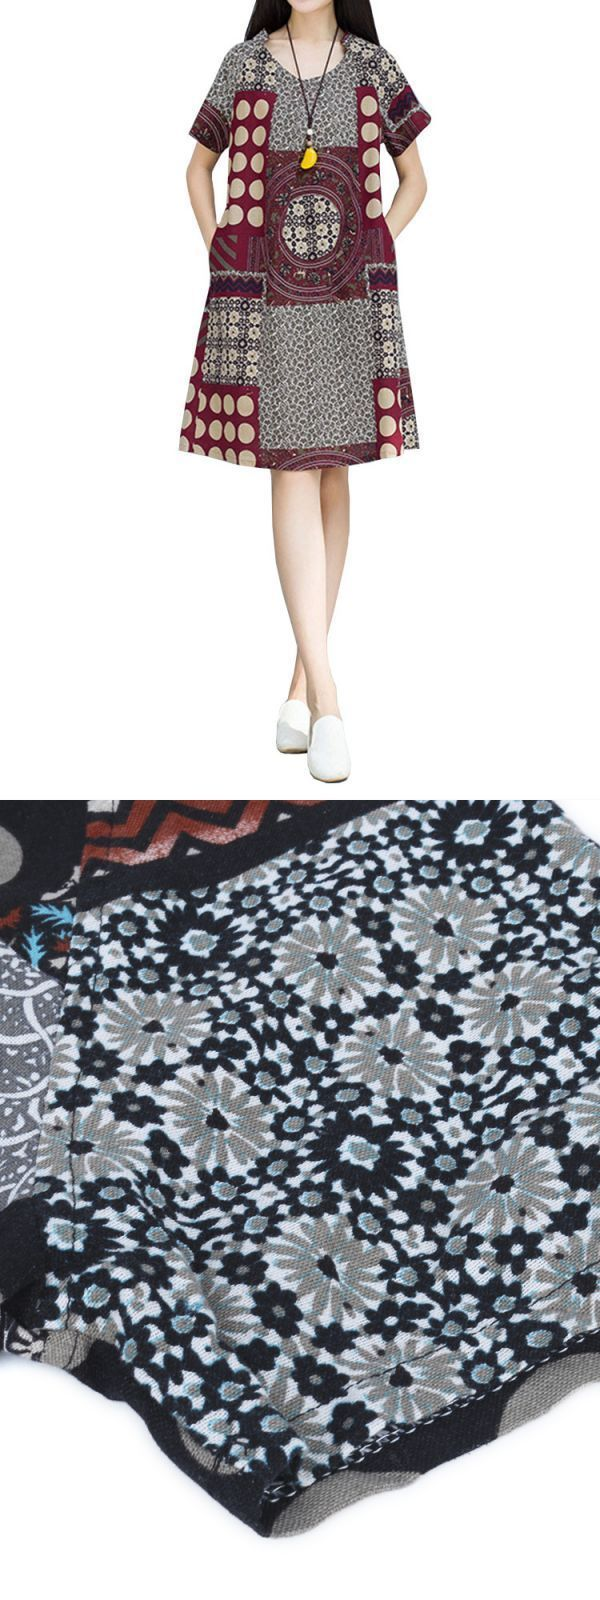 Vintage women short sleeve geometric printing cotton linen dress casual dresses in pakistan #casual #after #5 #dresses #casual #dresses #sale #casual #dresses #zalora #v #neck #casual #wedding #dresses